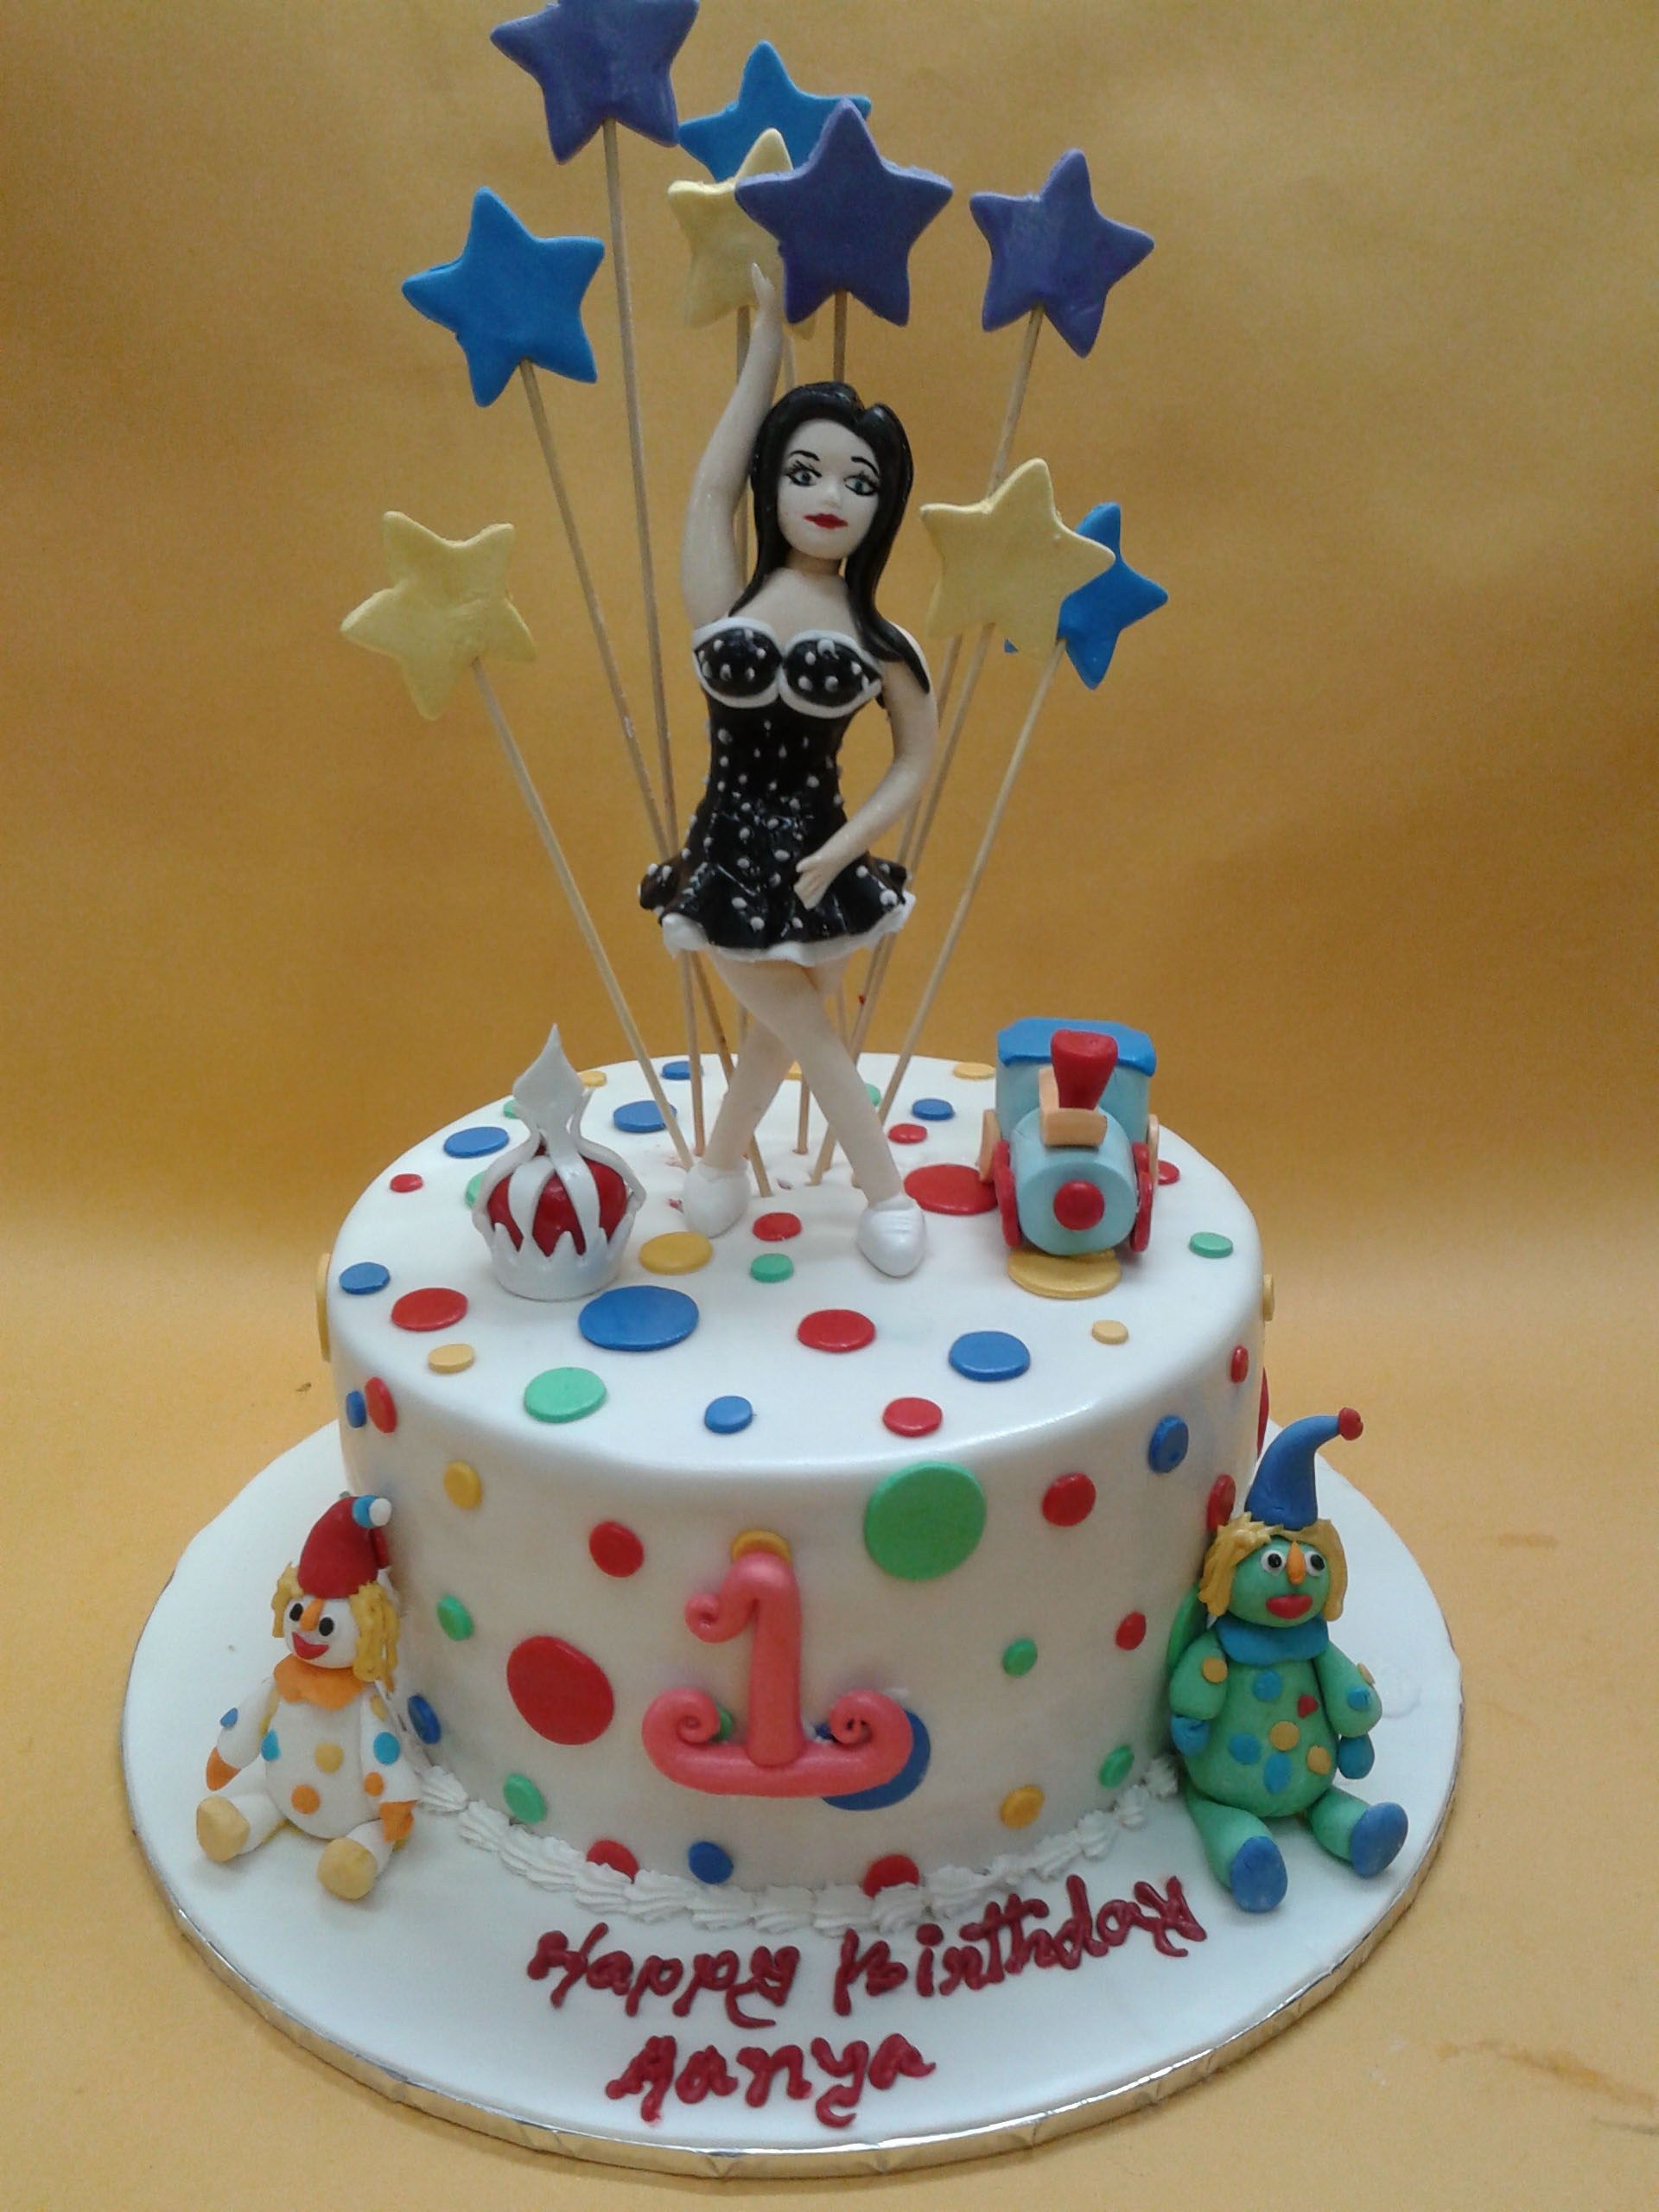 21 Great Photo Of 3d Birthday Cakes 3d Birthday Cake Fancy Birthday Cakes Diy Birthday Cake